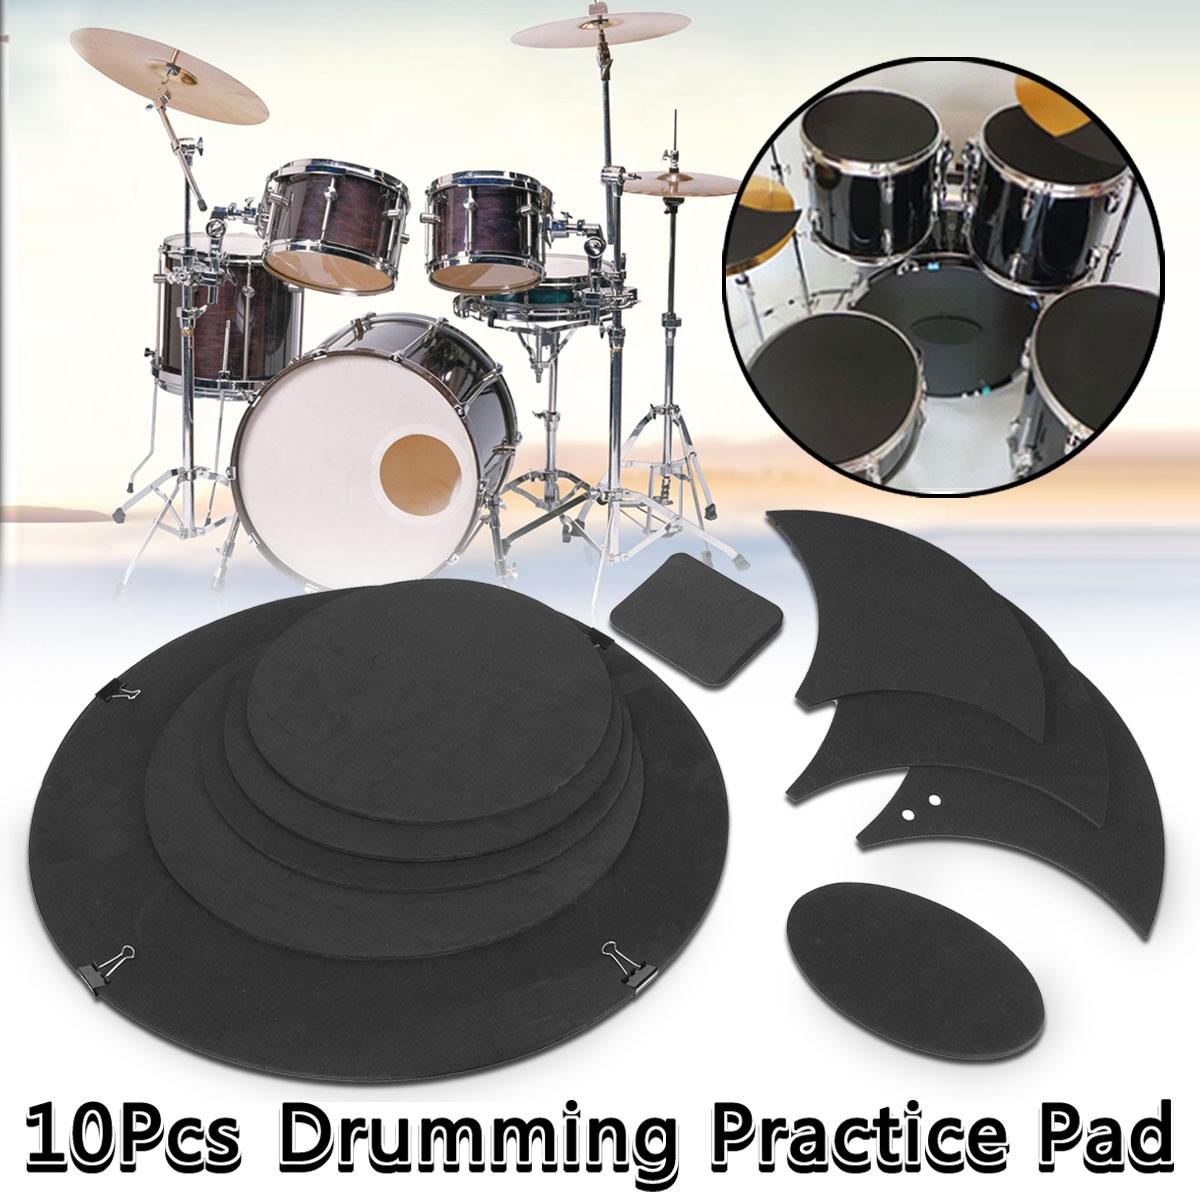 Zebra 10Pcs Rubber Foam Bass Snare Drum Sound Off Mute Silencer Drumming Rubber Practice Pad Set Percussion Bass Quiet Drum Tool басовый пэд millenium e drum bass drum pad